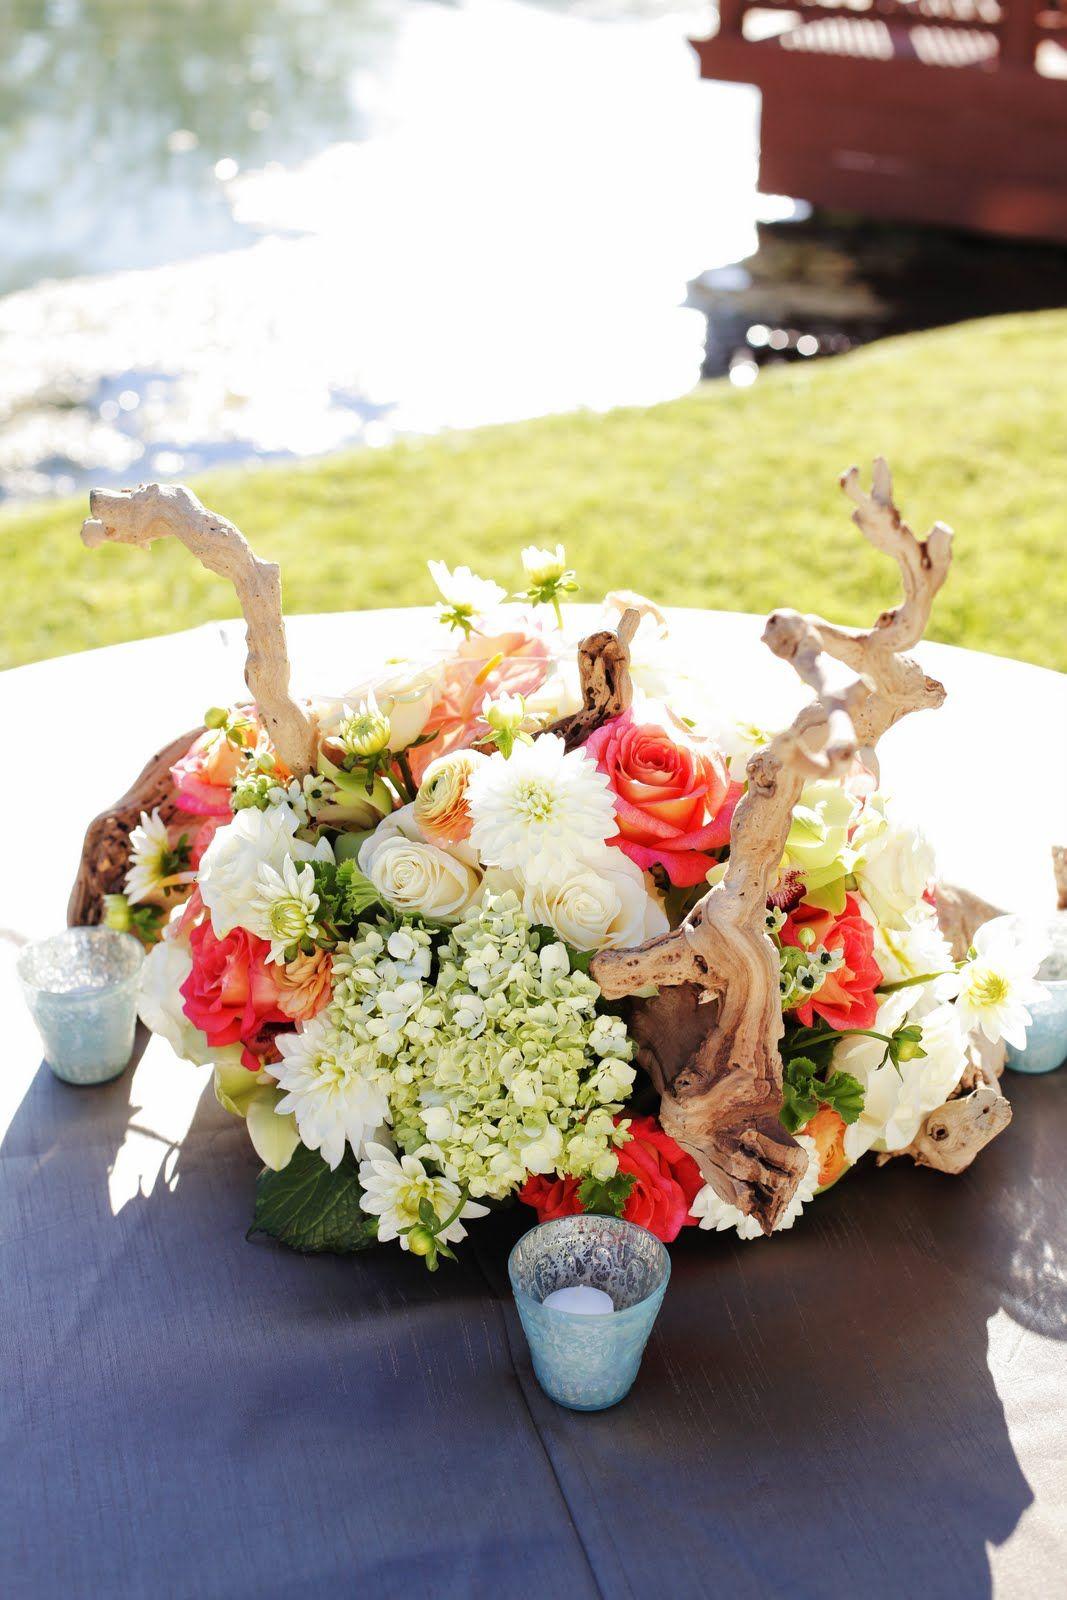 bloomers flowers & decor Beach wedding centerpieces